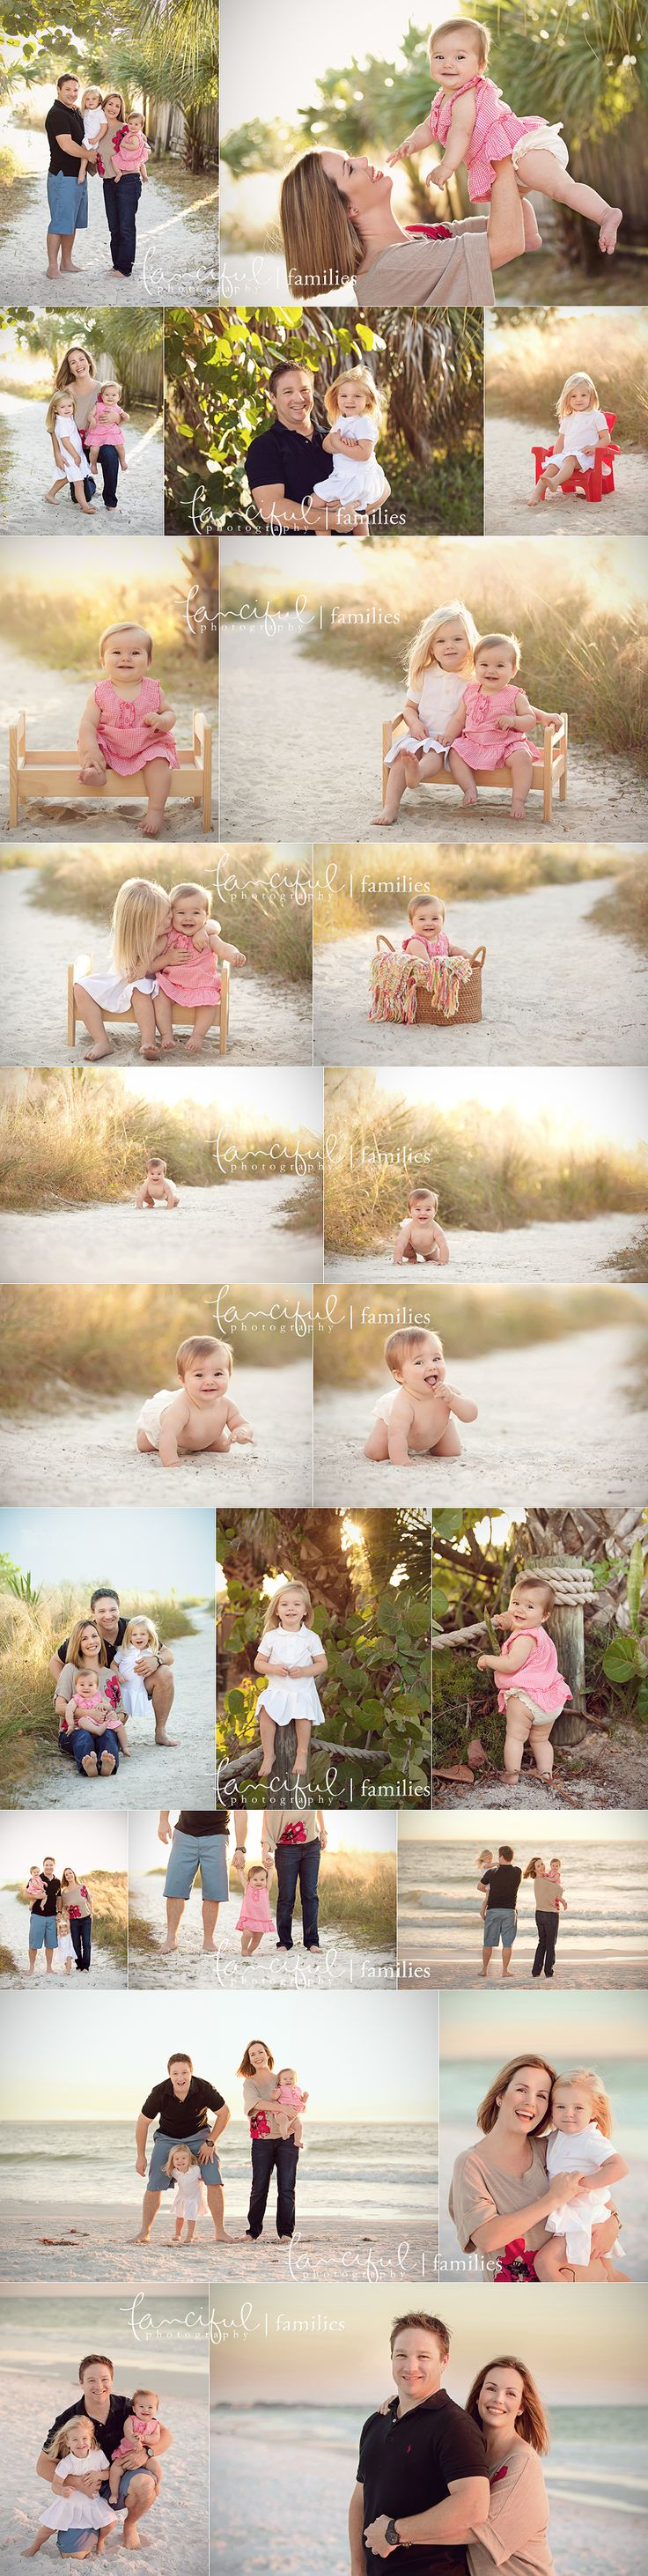 Family Beach Portraits fancifulphotograp...